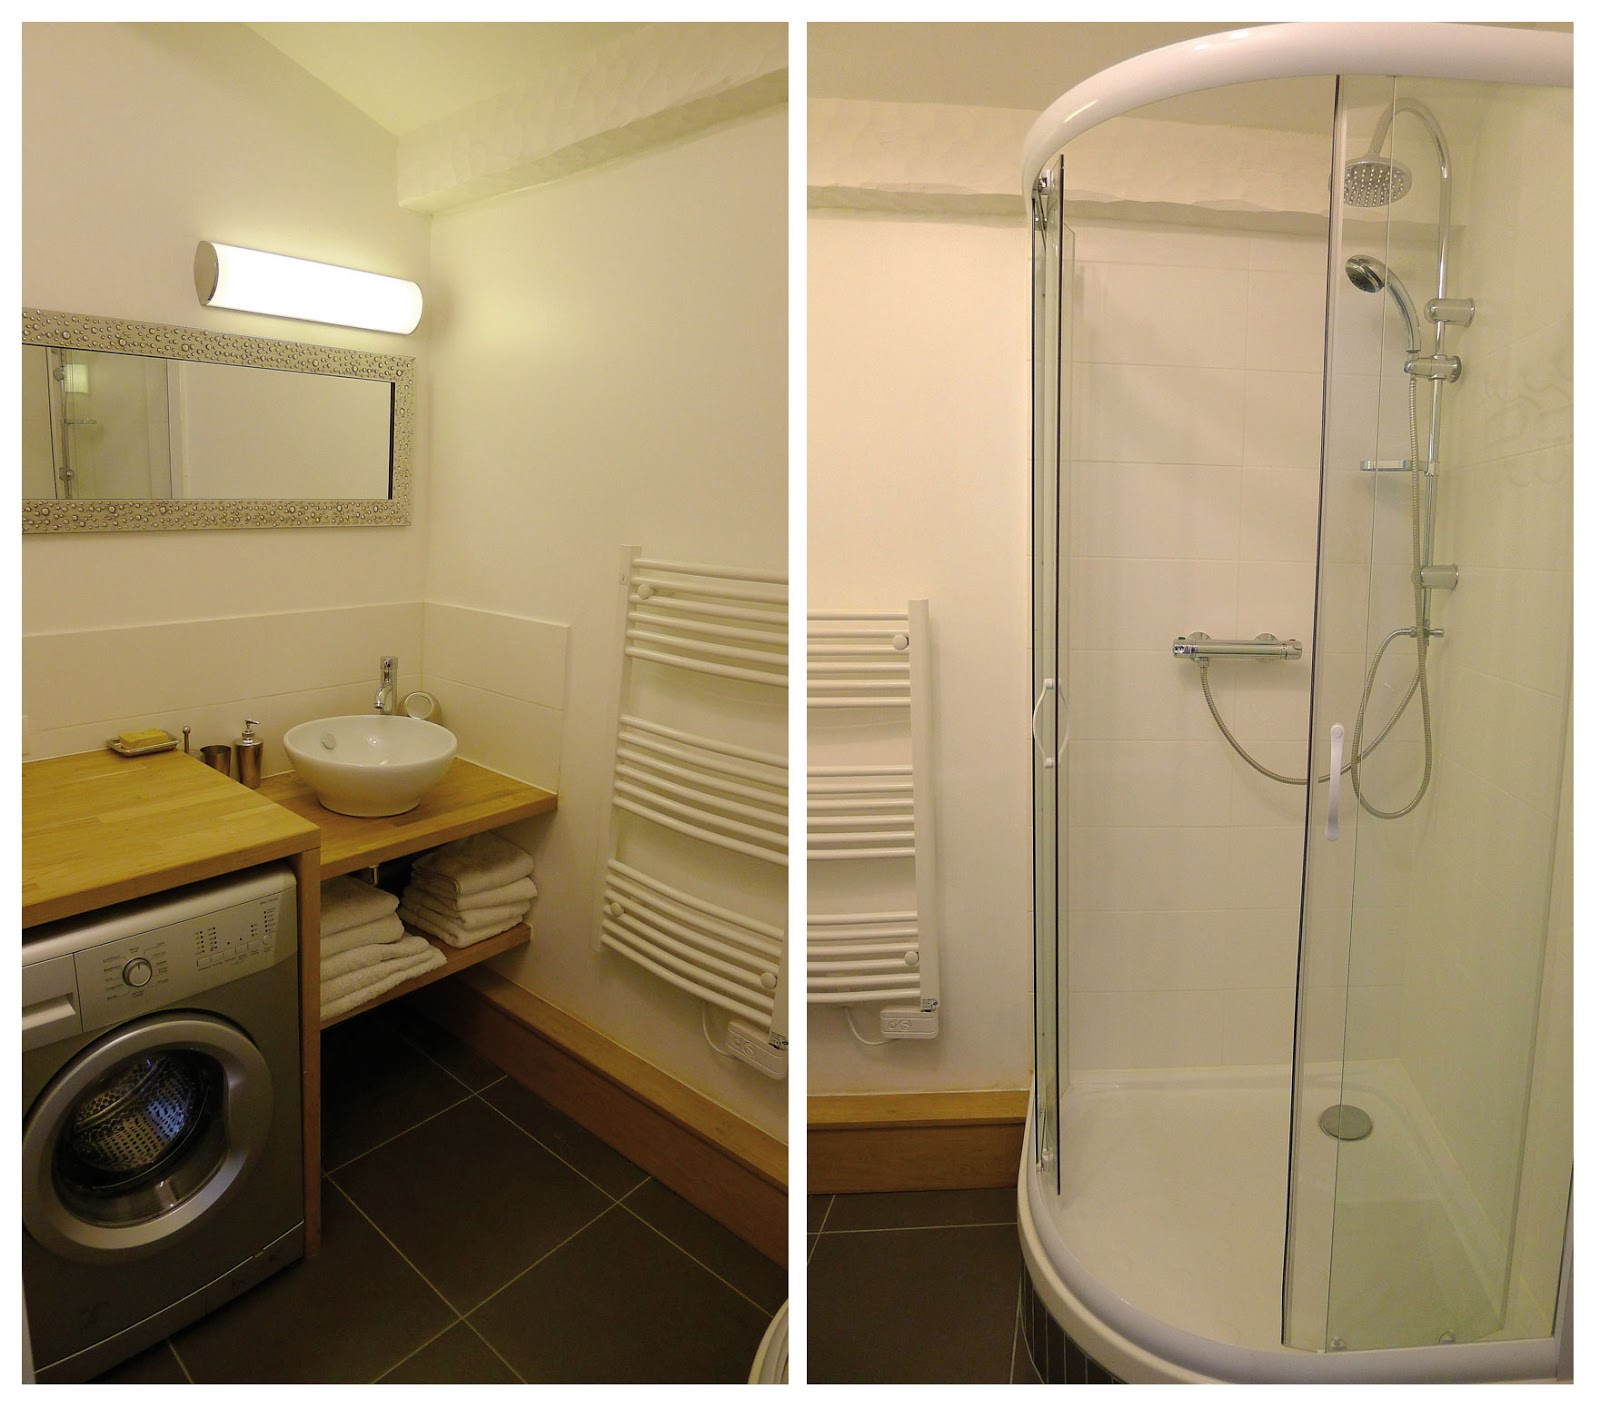 Location la rochelle - Salle de bain avec machine a laver ...